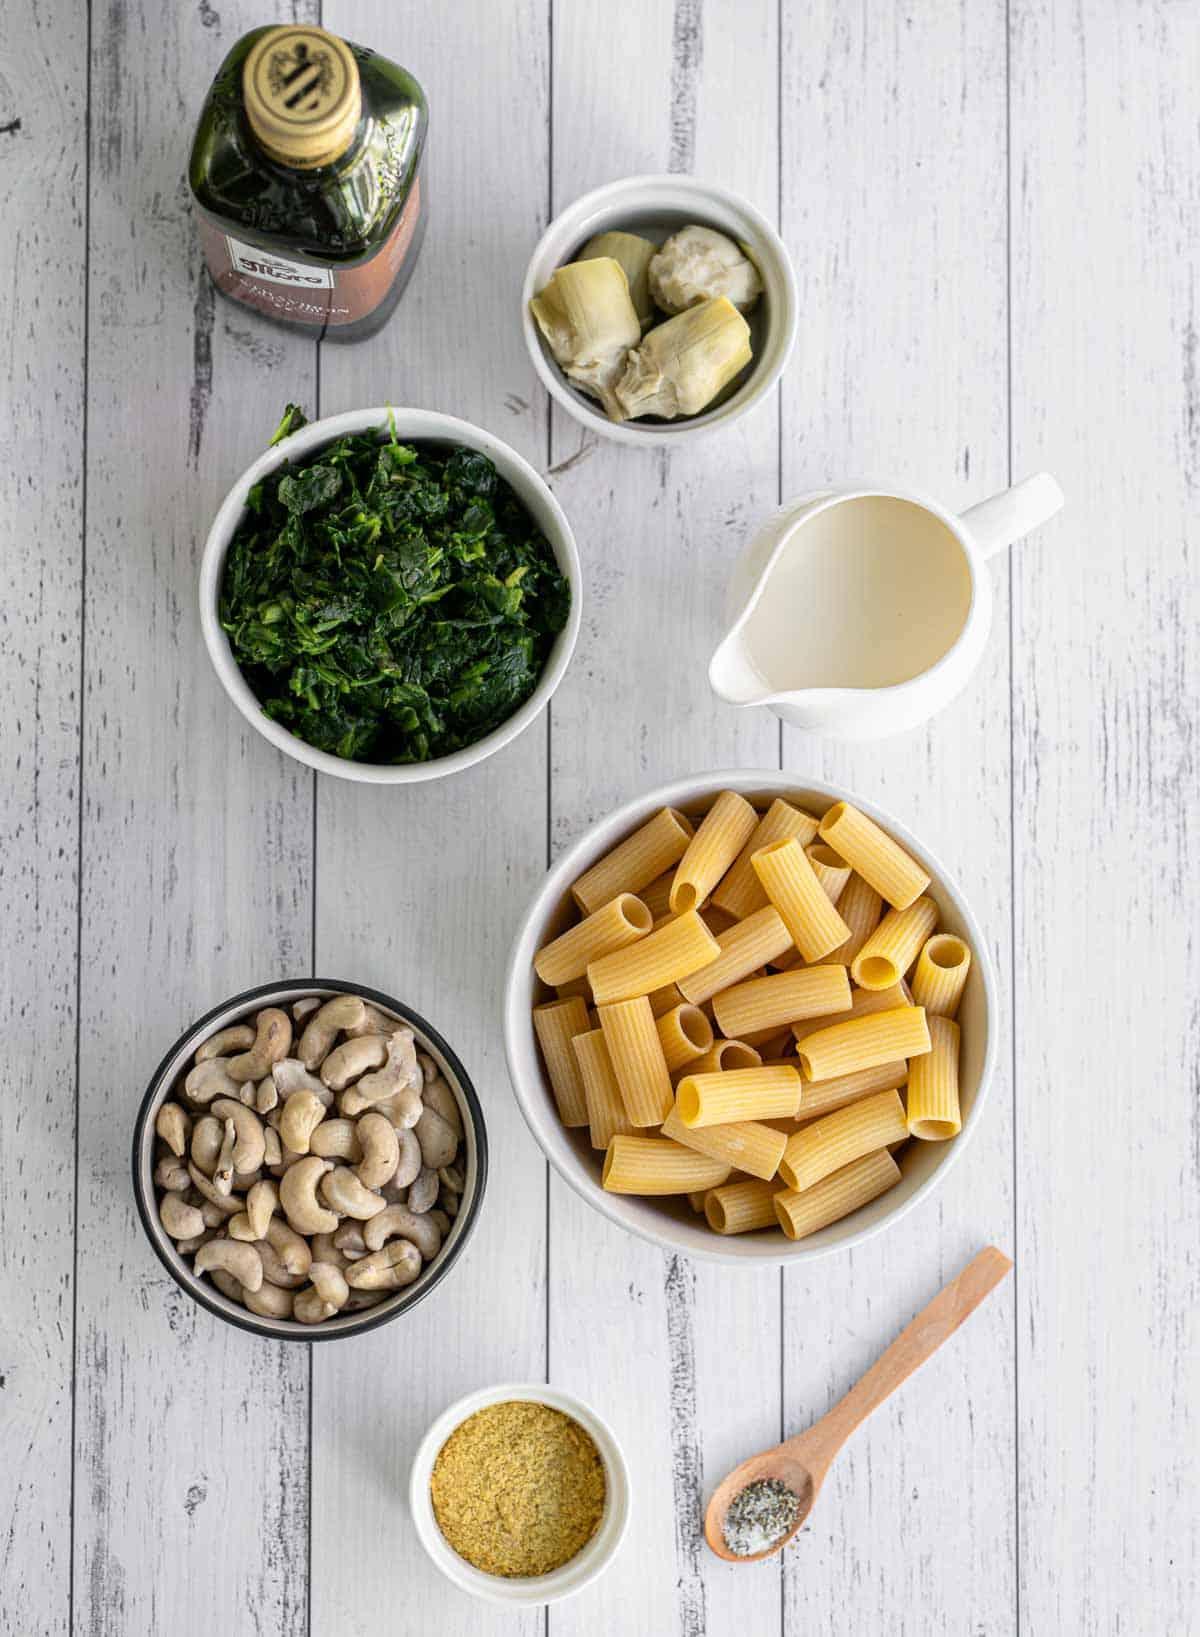 Ingredients to make creamy spinach artichoke pasta.